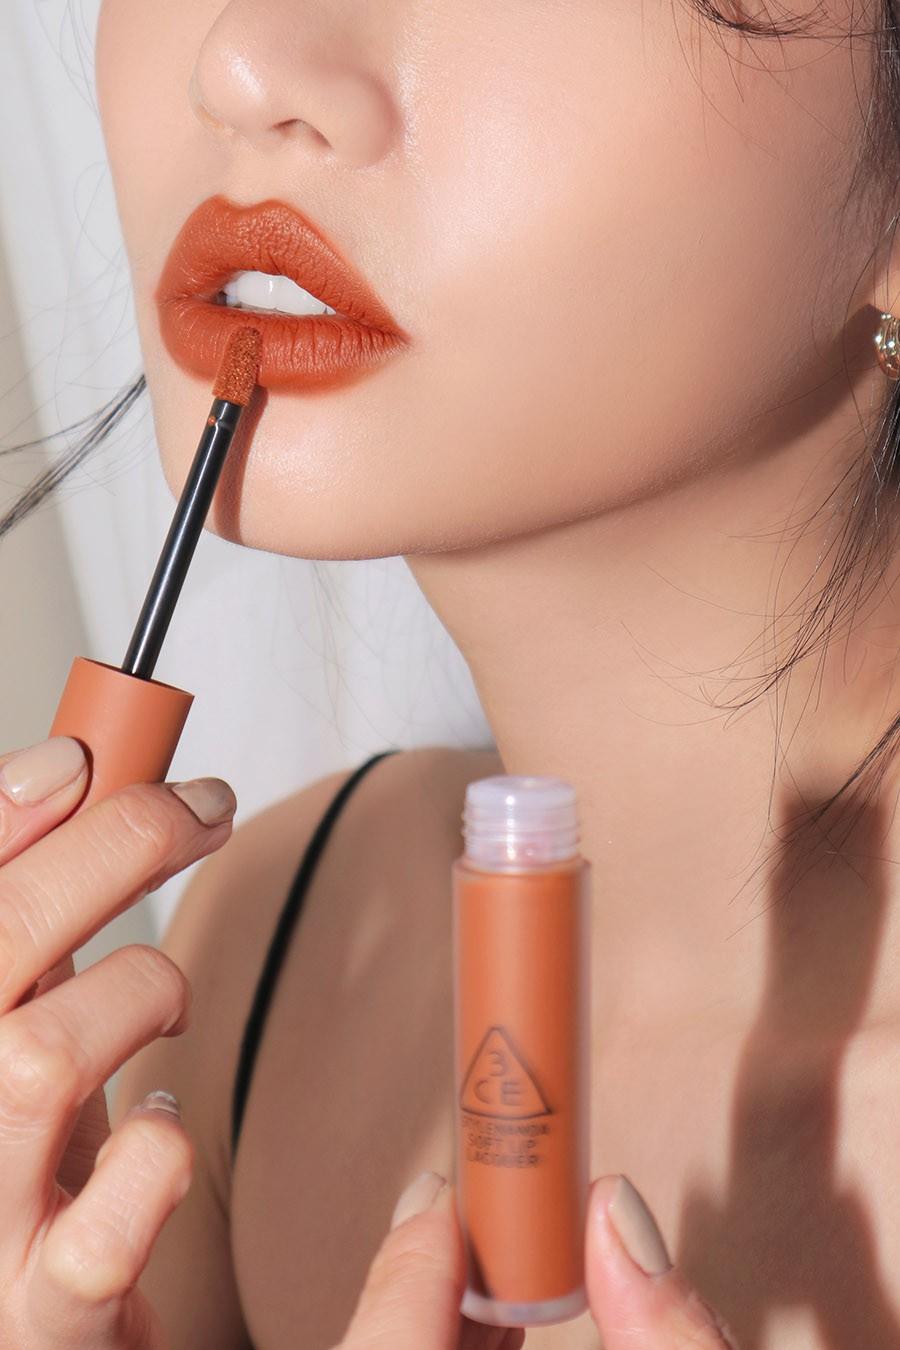 Son kem 3CE Soft Lip Lacquer màu Tawny Red (cam đất)